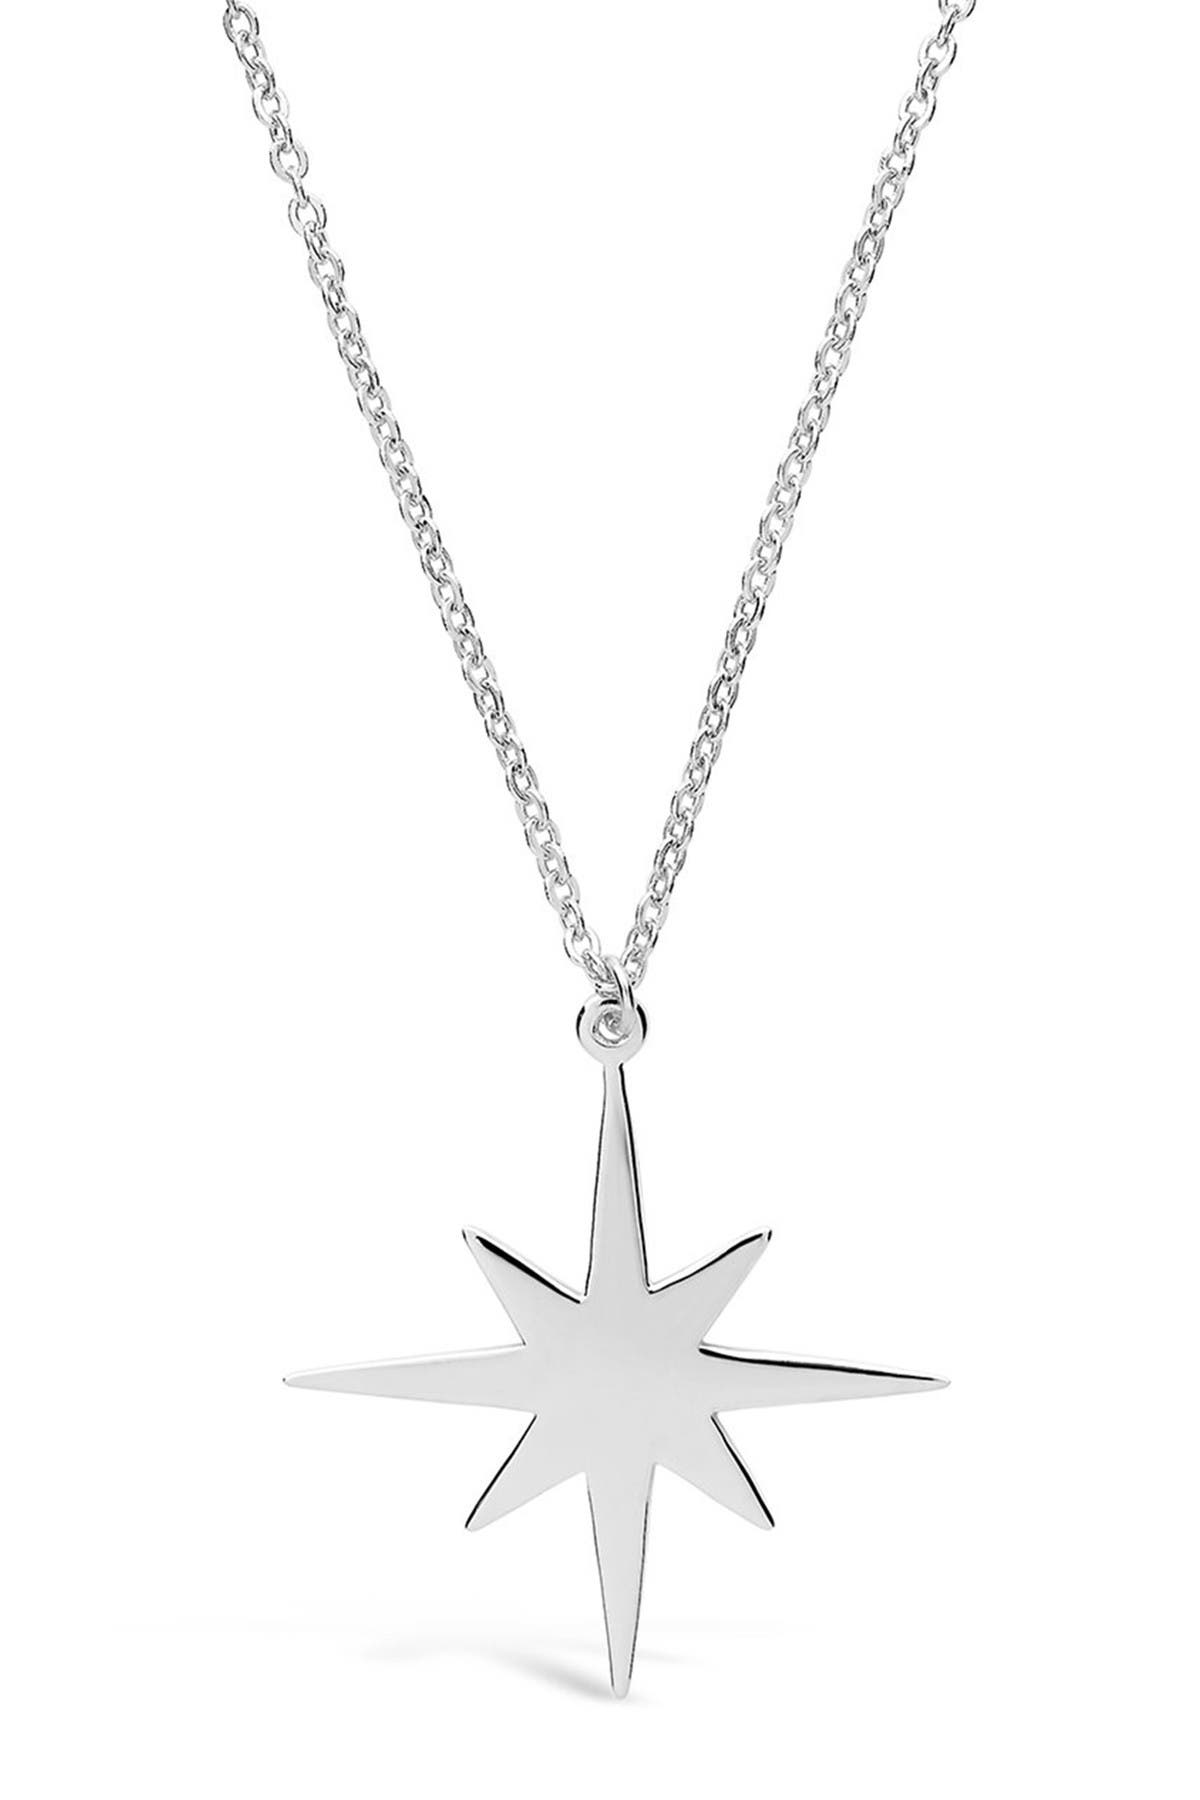 Image of Sterling Forever Sterling Silver Bursting Star Pendant Necklace